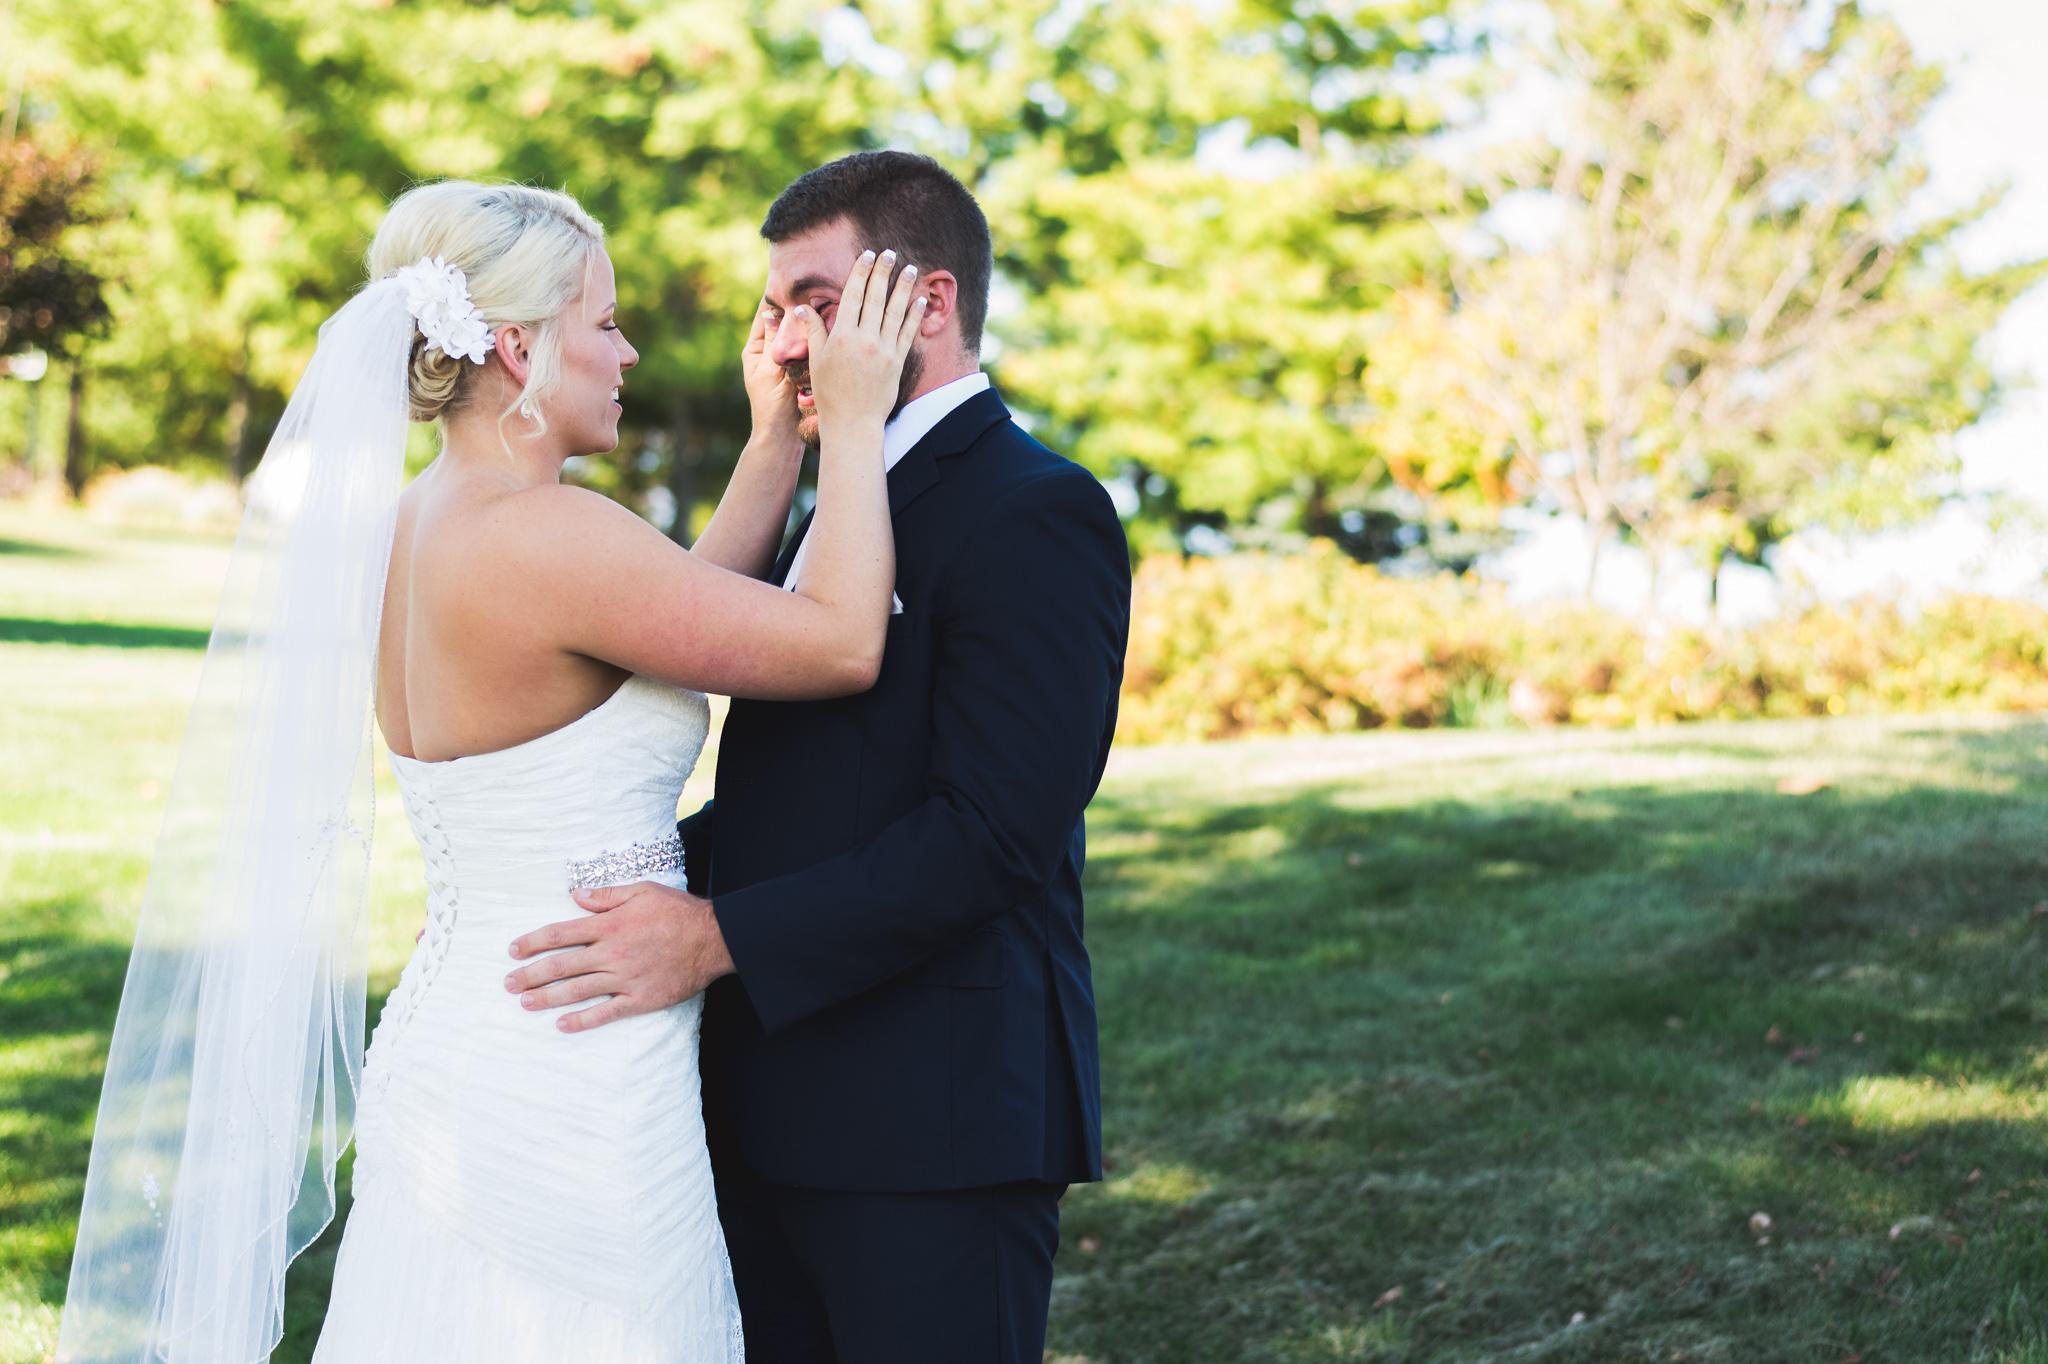 Ryan & Macy's Wedding | North Dakota Wedding Photography | Chelsea Joy Photography